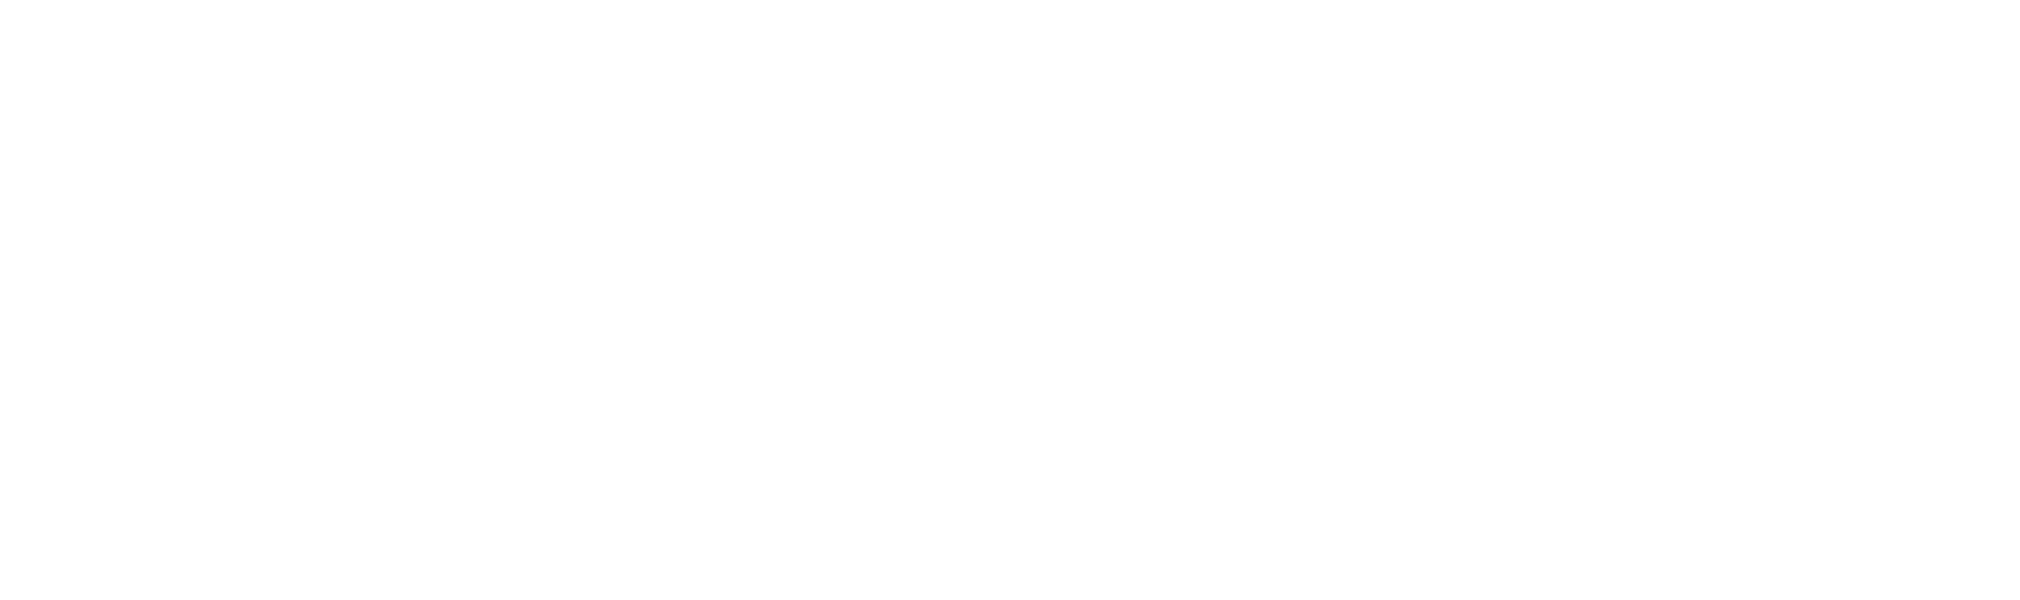 Labodiwo